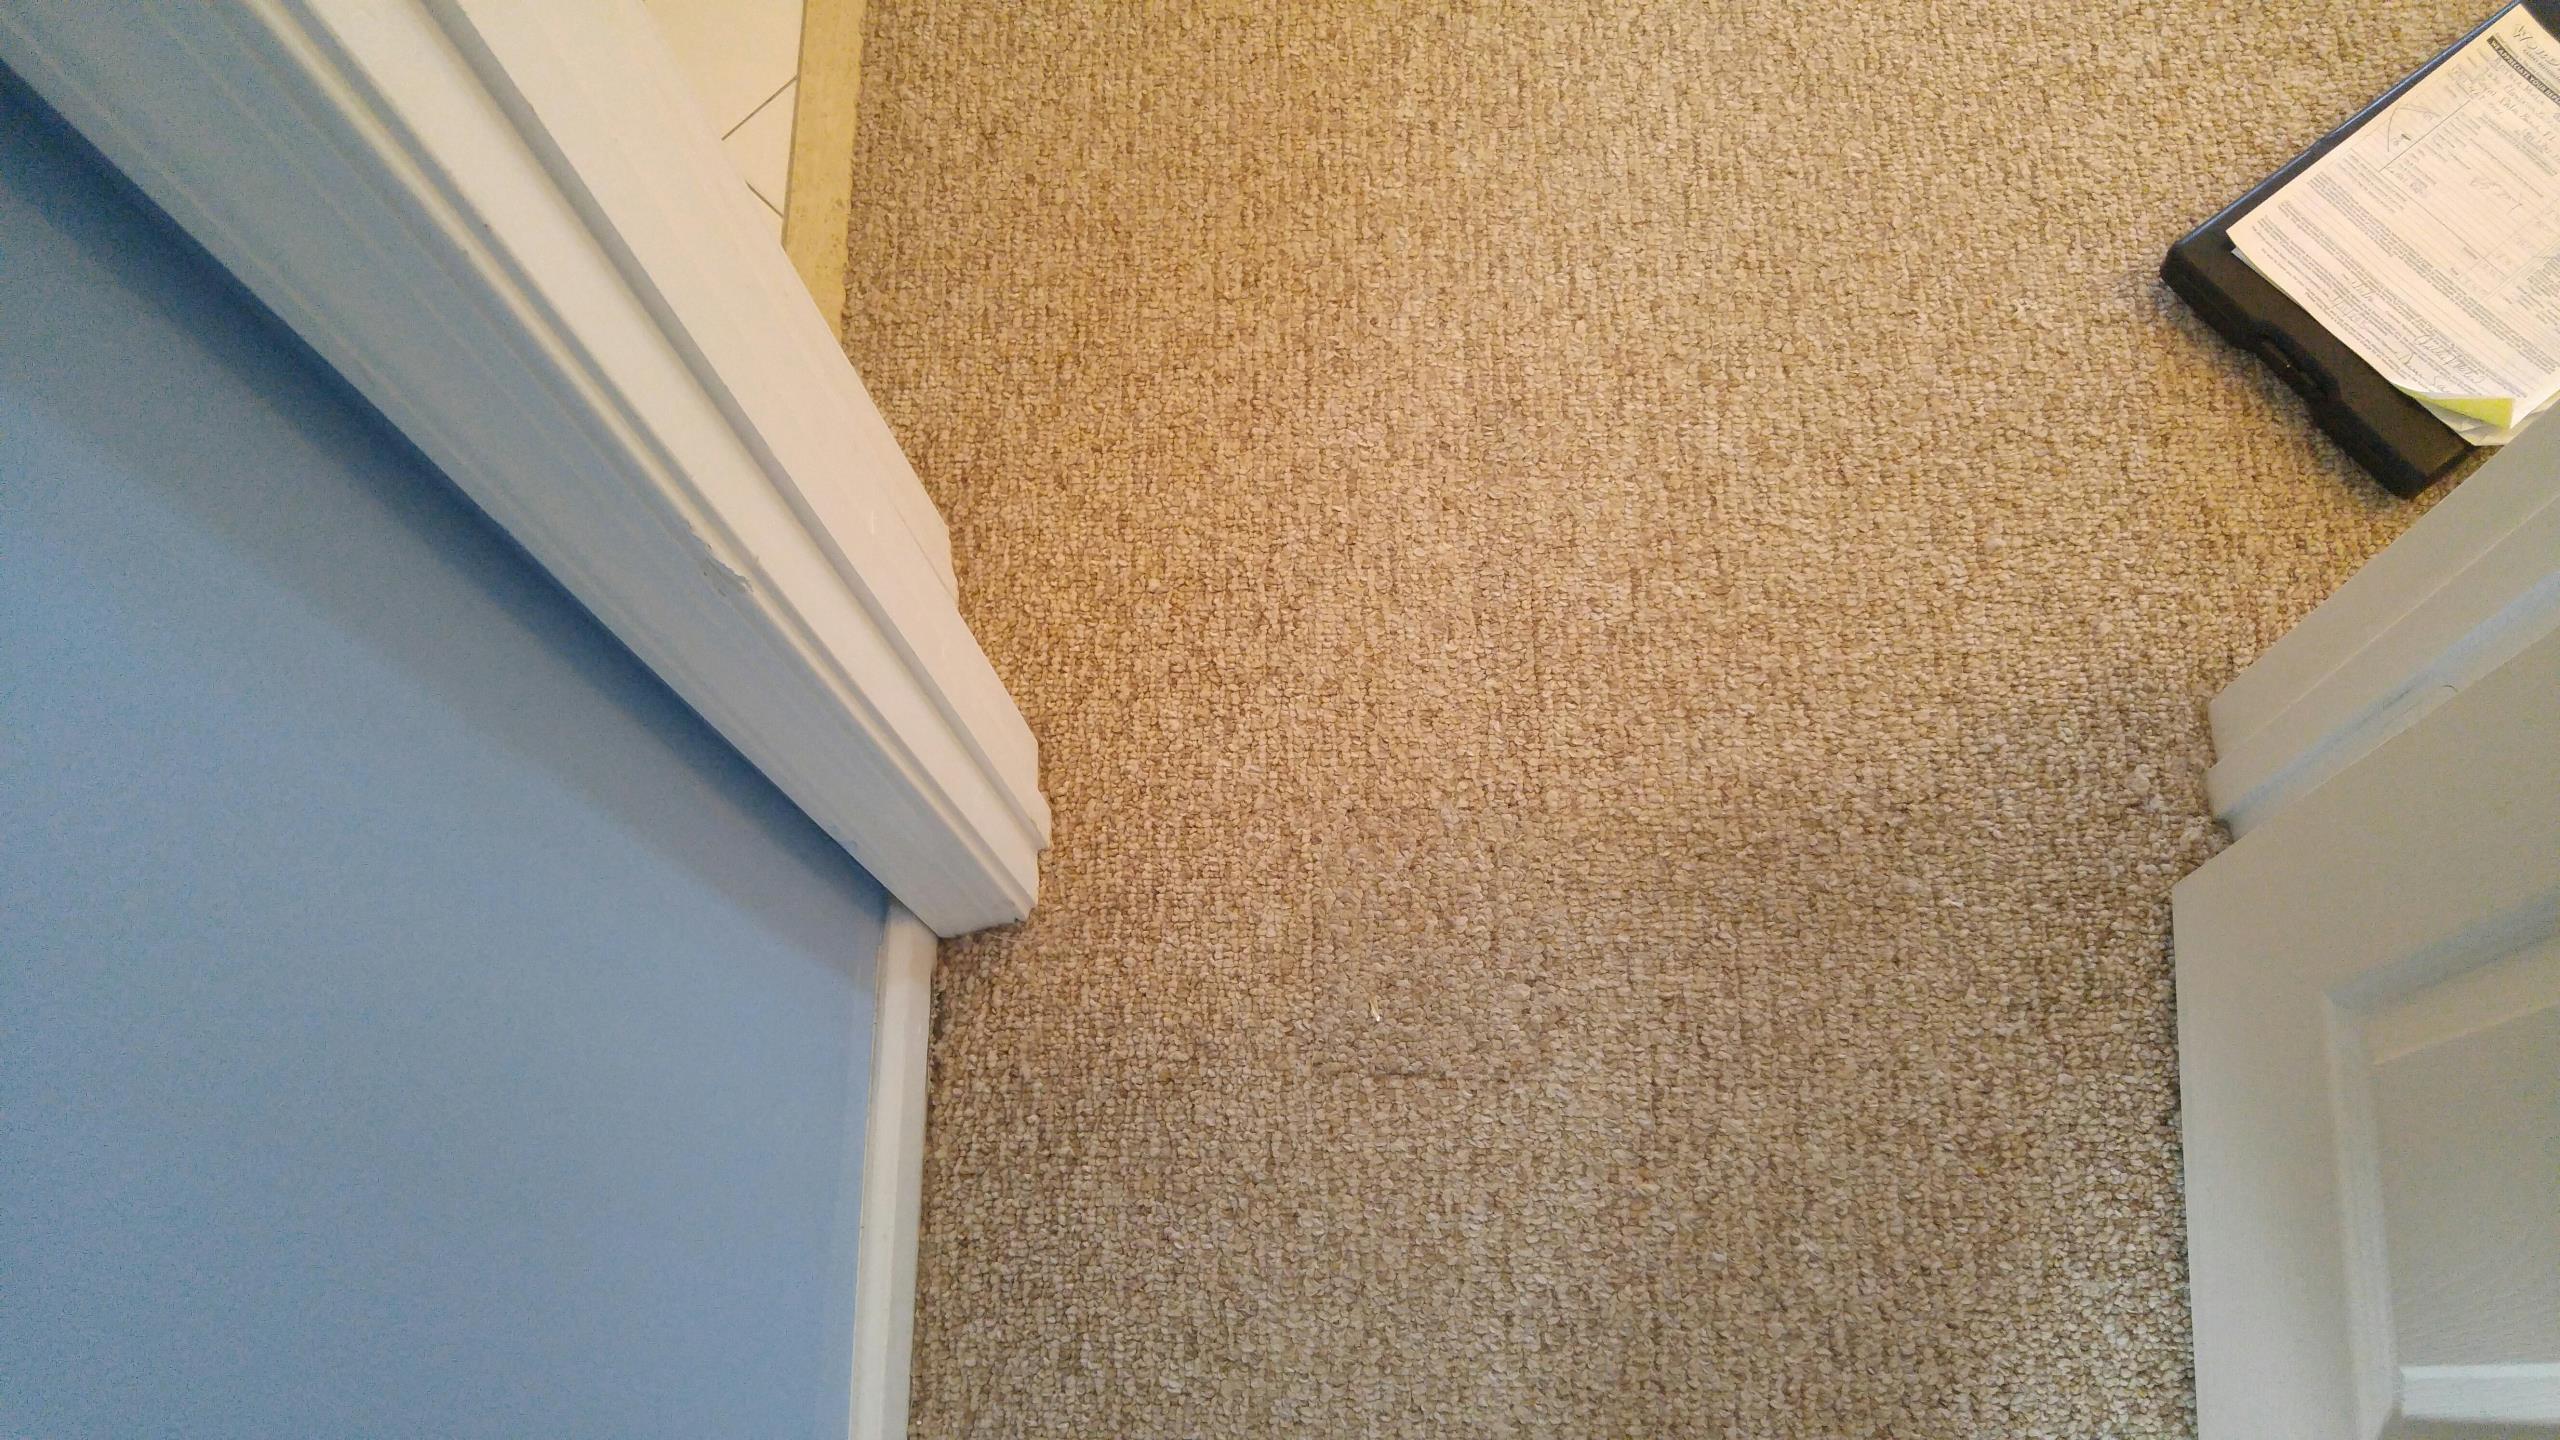 carpet repair Royal Palm Beach dog pull carpet apart..